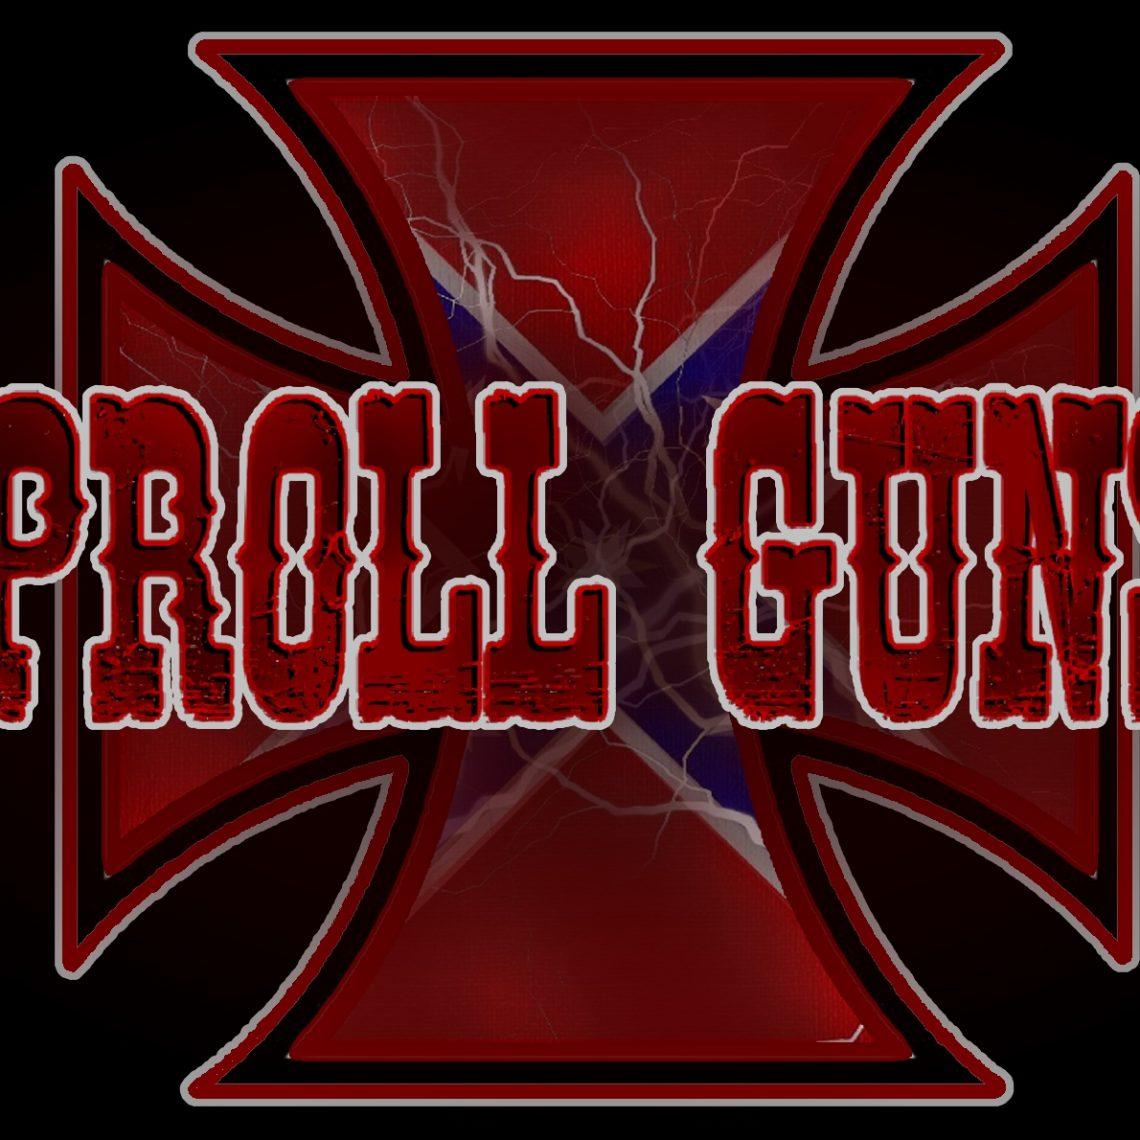 PROLL GUNS – Horseflesh BBQ – CD Review